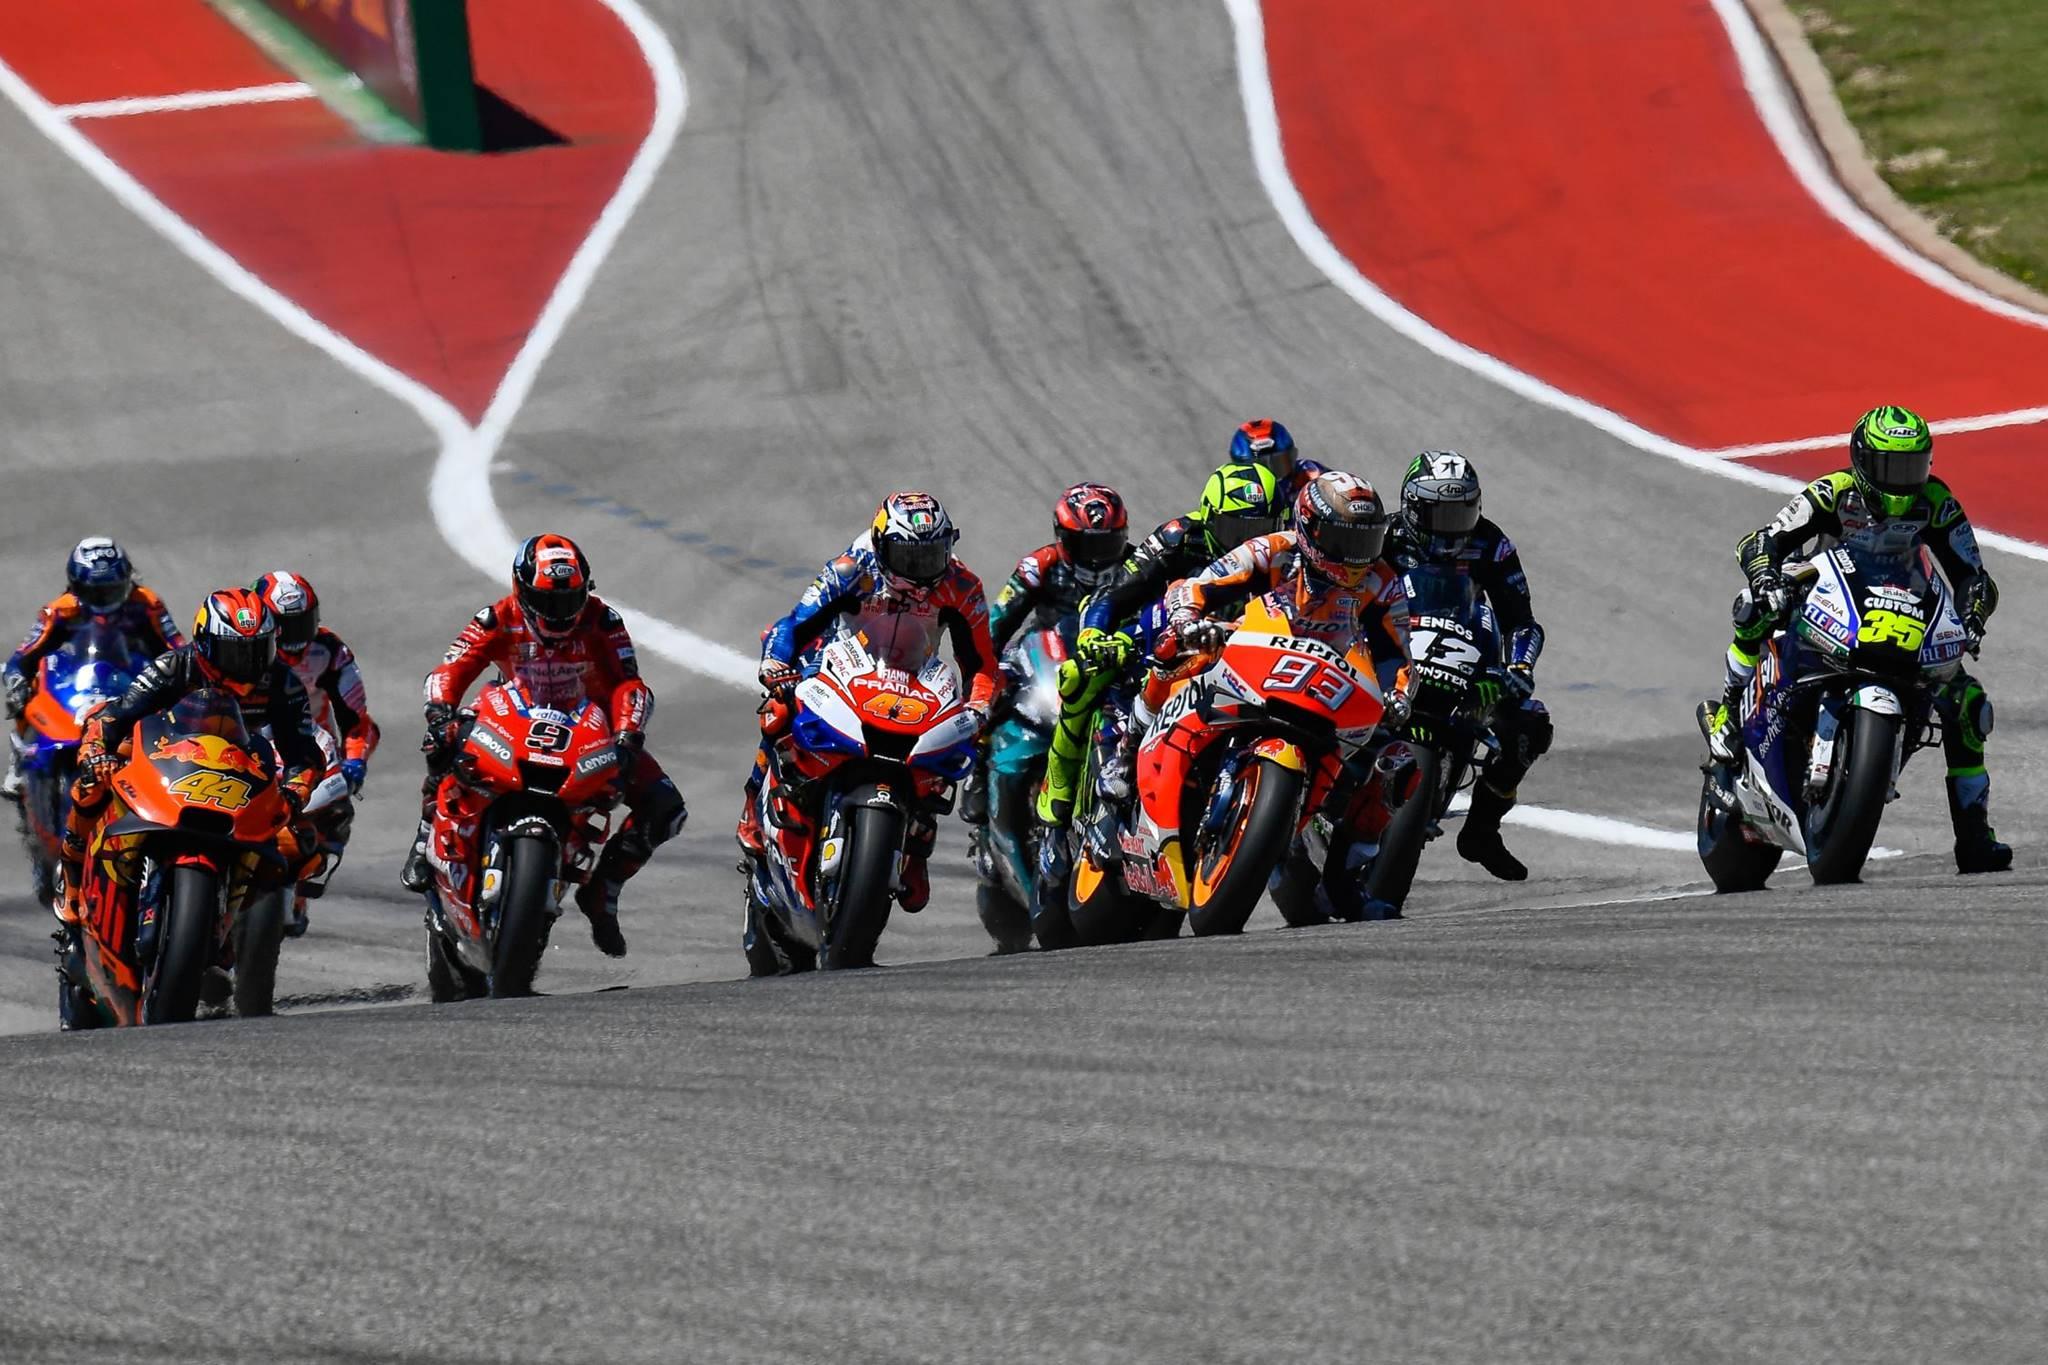 MotoGP_2019_AmericasGP_Xe_Tinhte_005.jpg